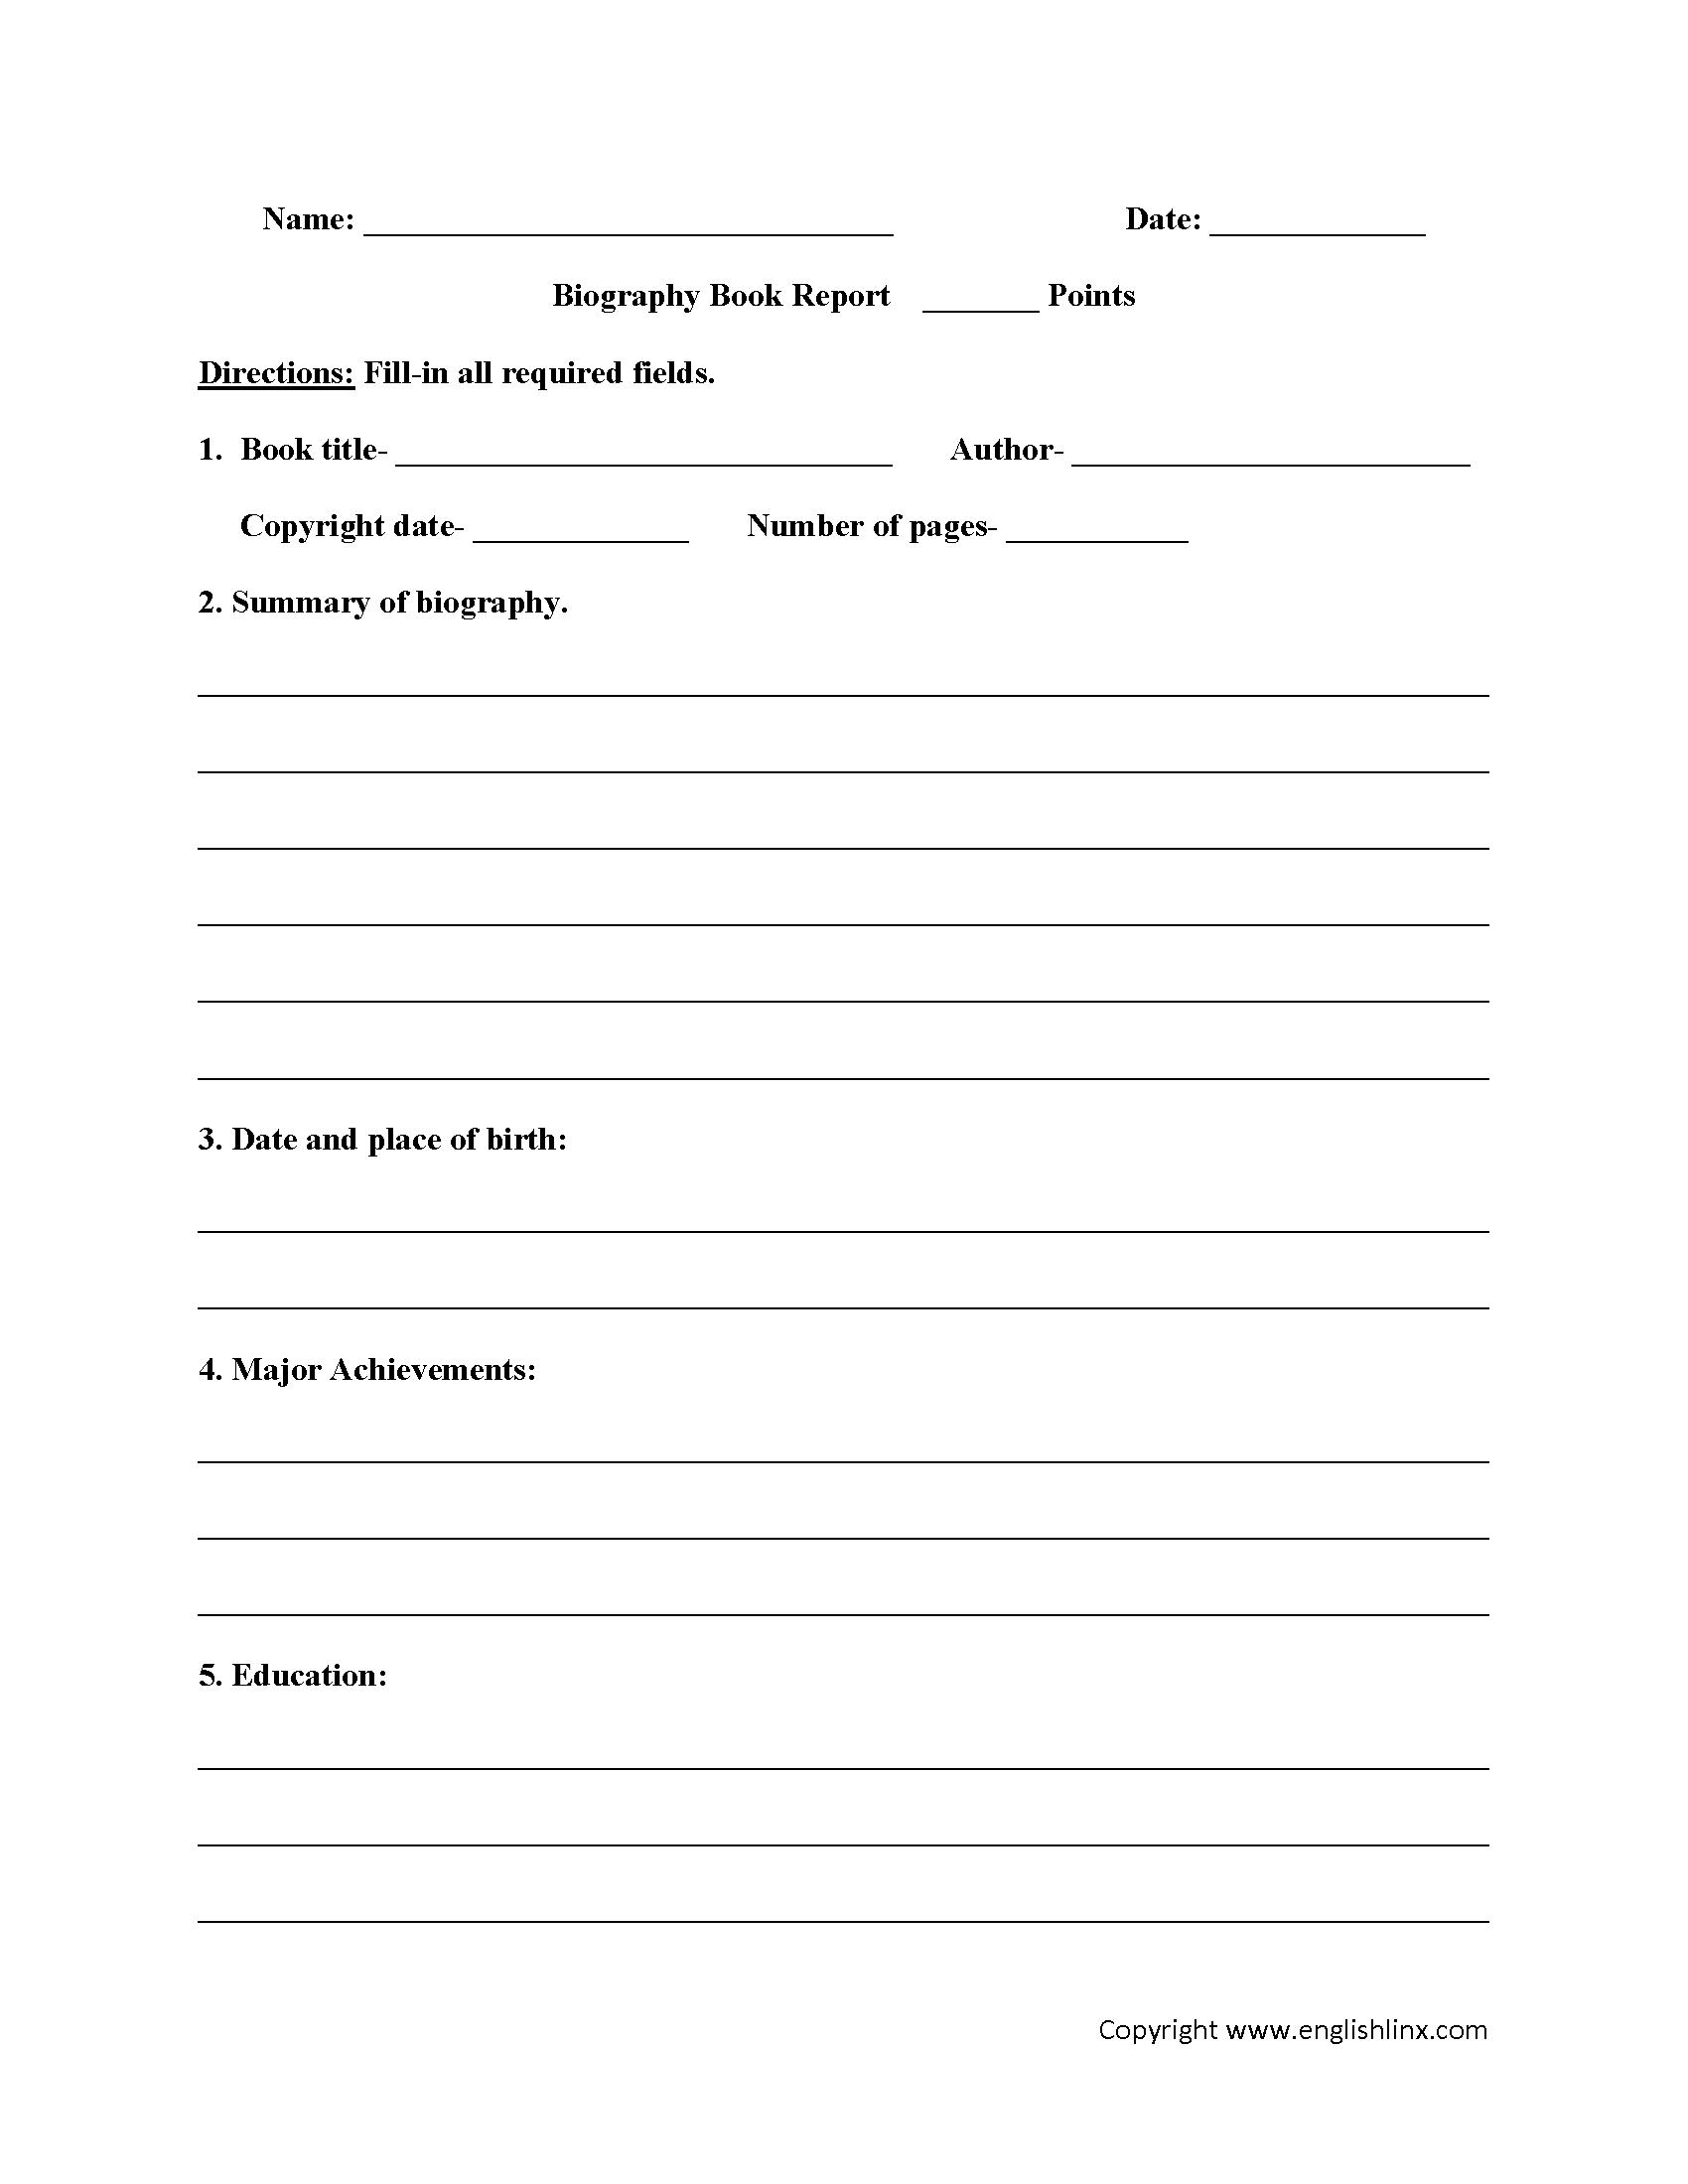 Biography Book Report Worksheets